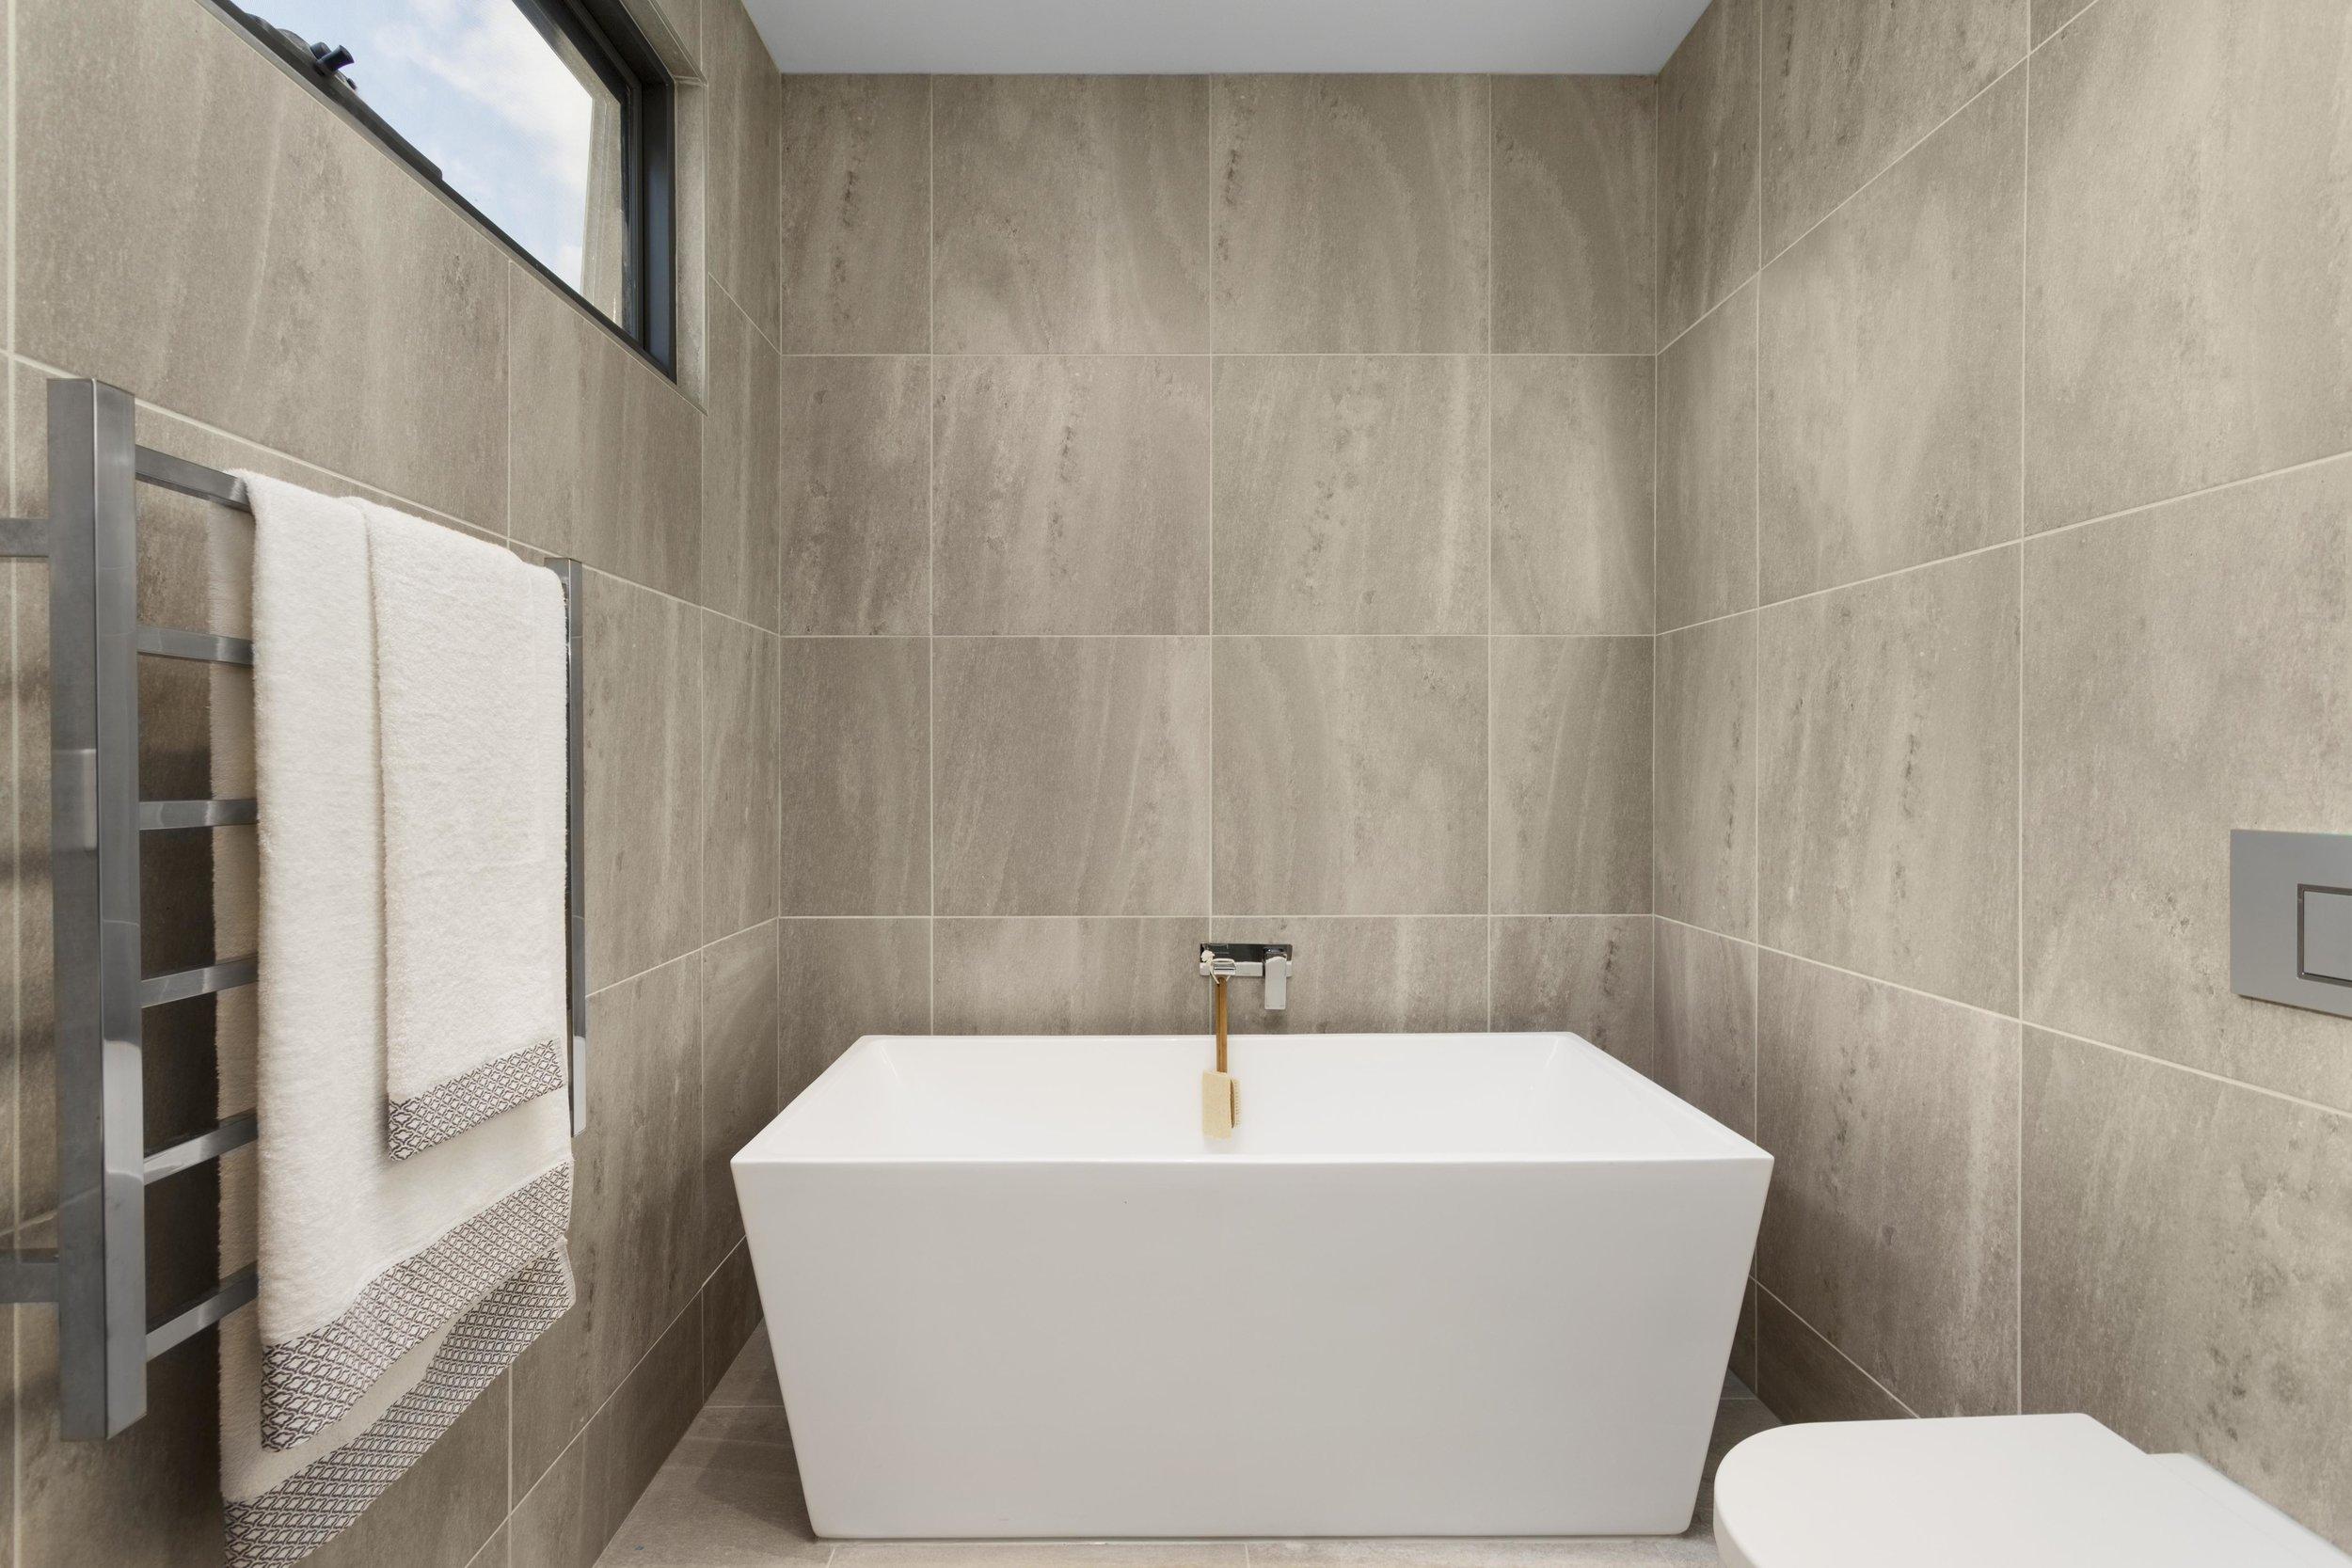 Armadale-Residence-Guymer-Bailey-Architects-09.jpg